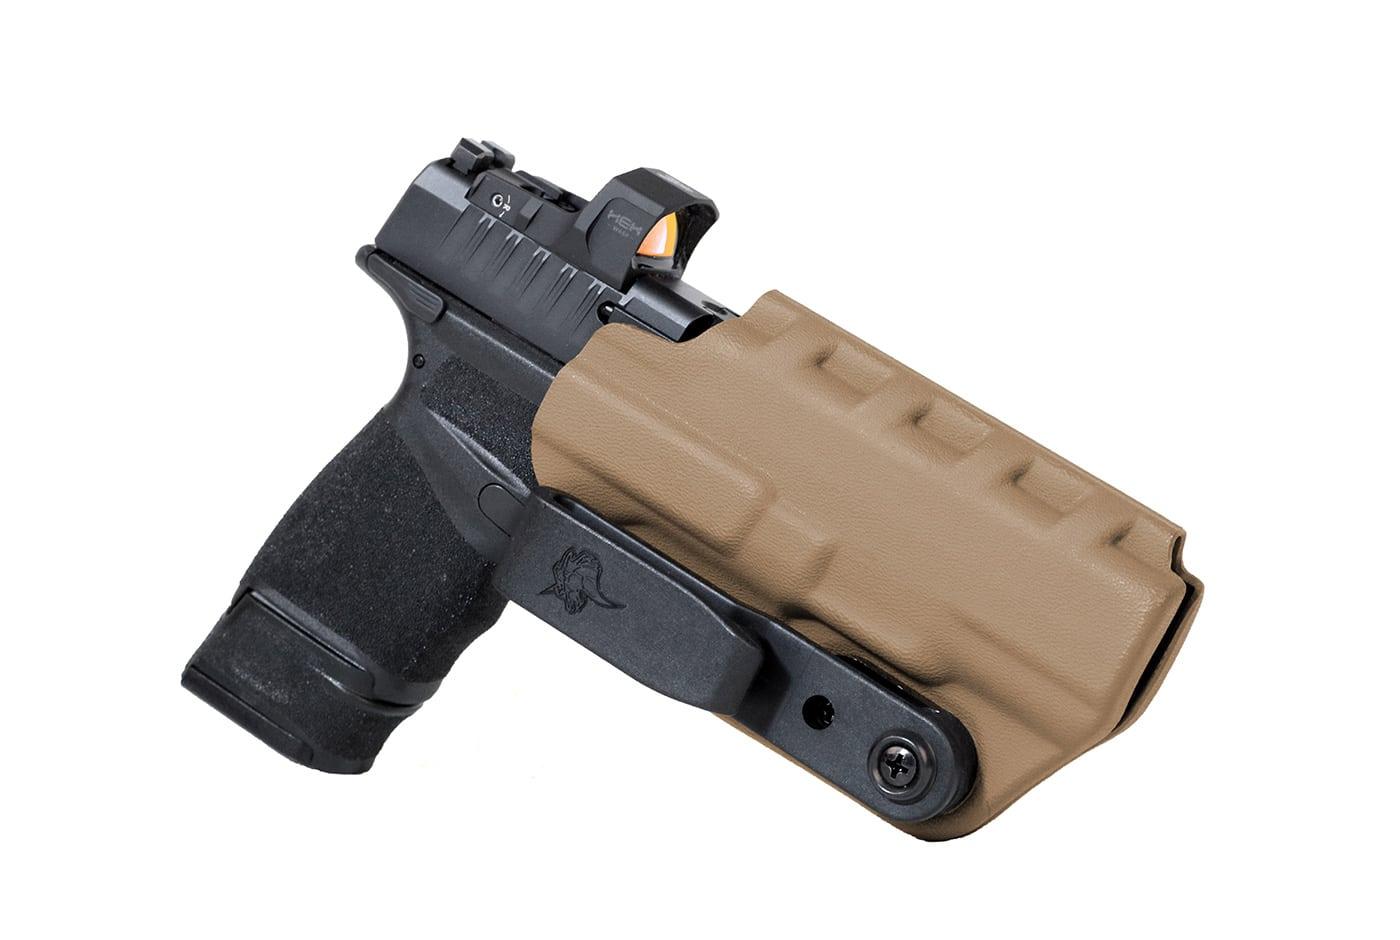 DeSantis Slim-Tuk IWB holster